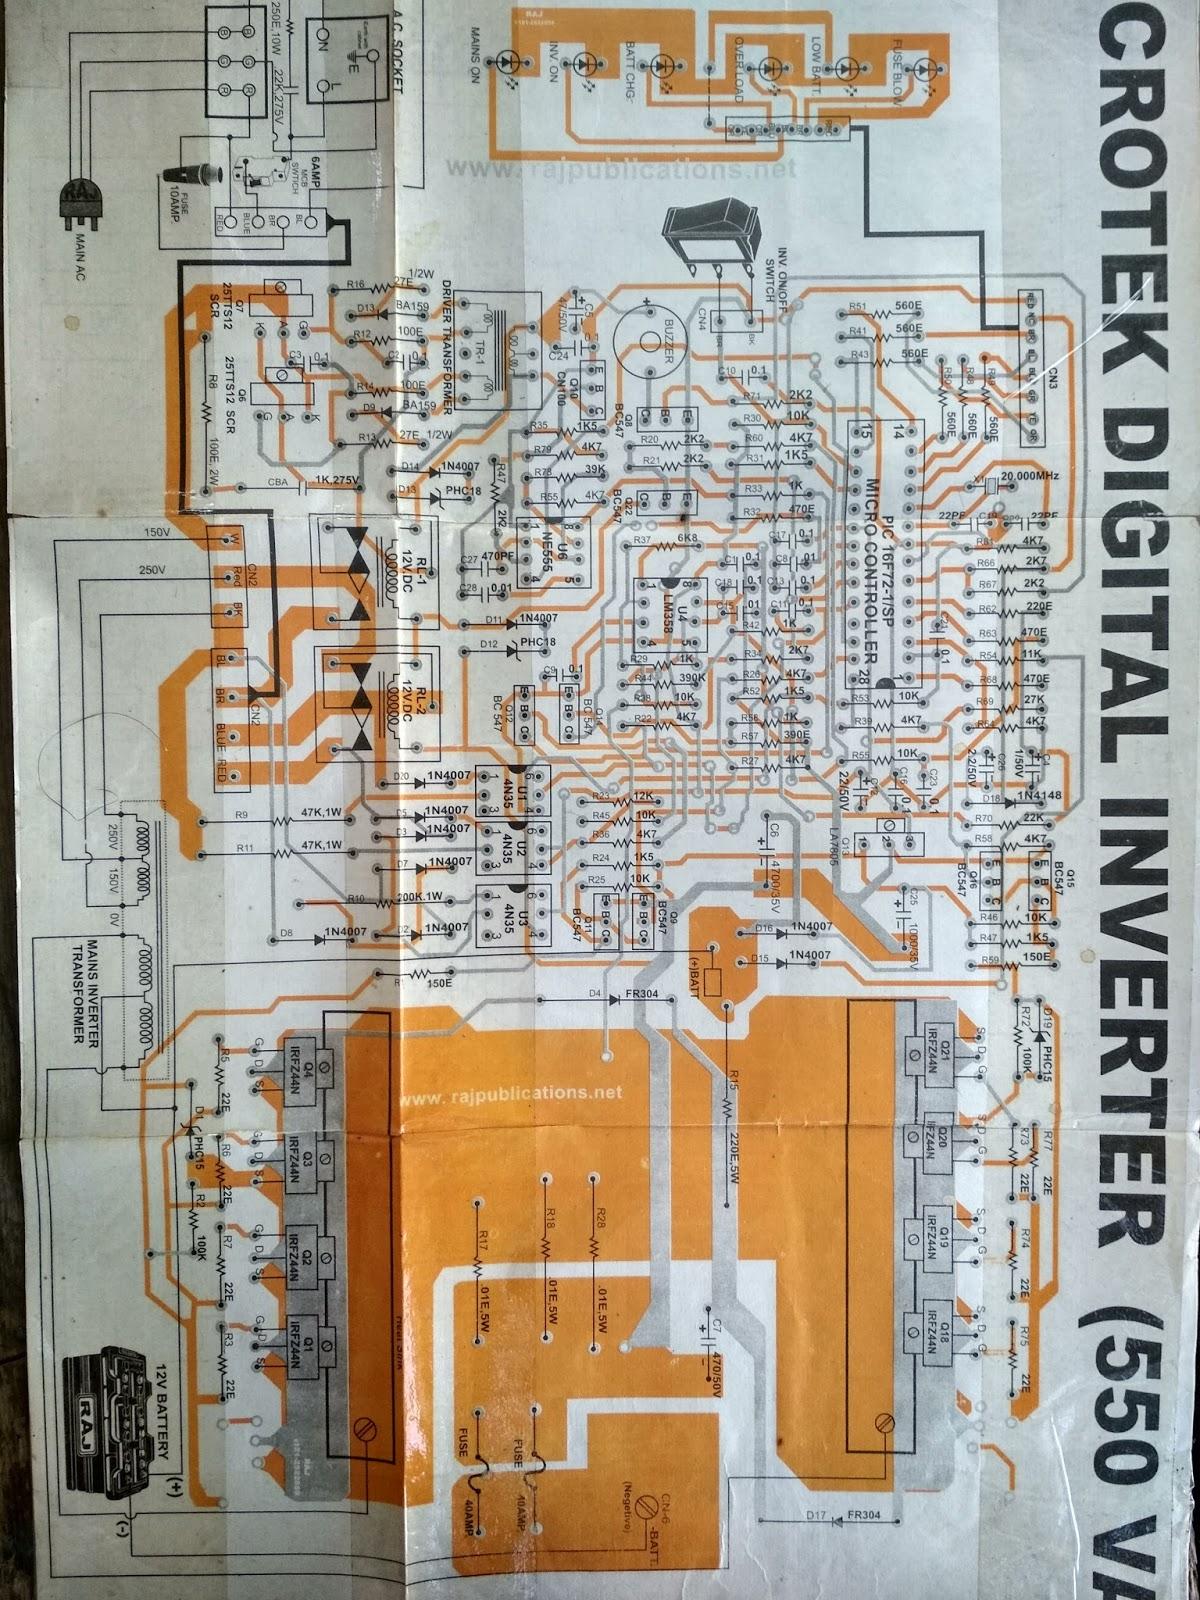 Pure Sinewave inverter diagram: Microtek digital inverter diagram HD